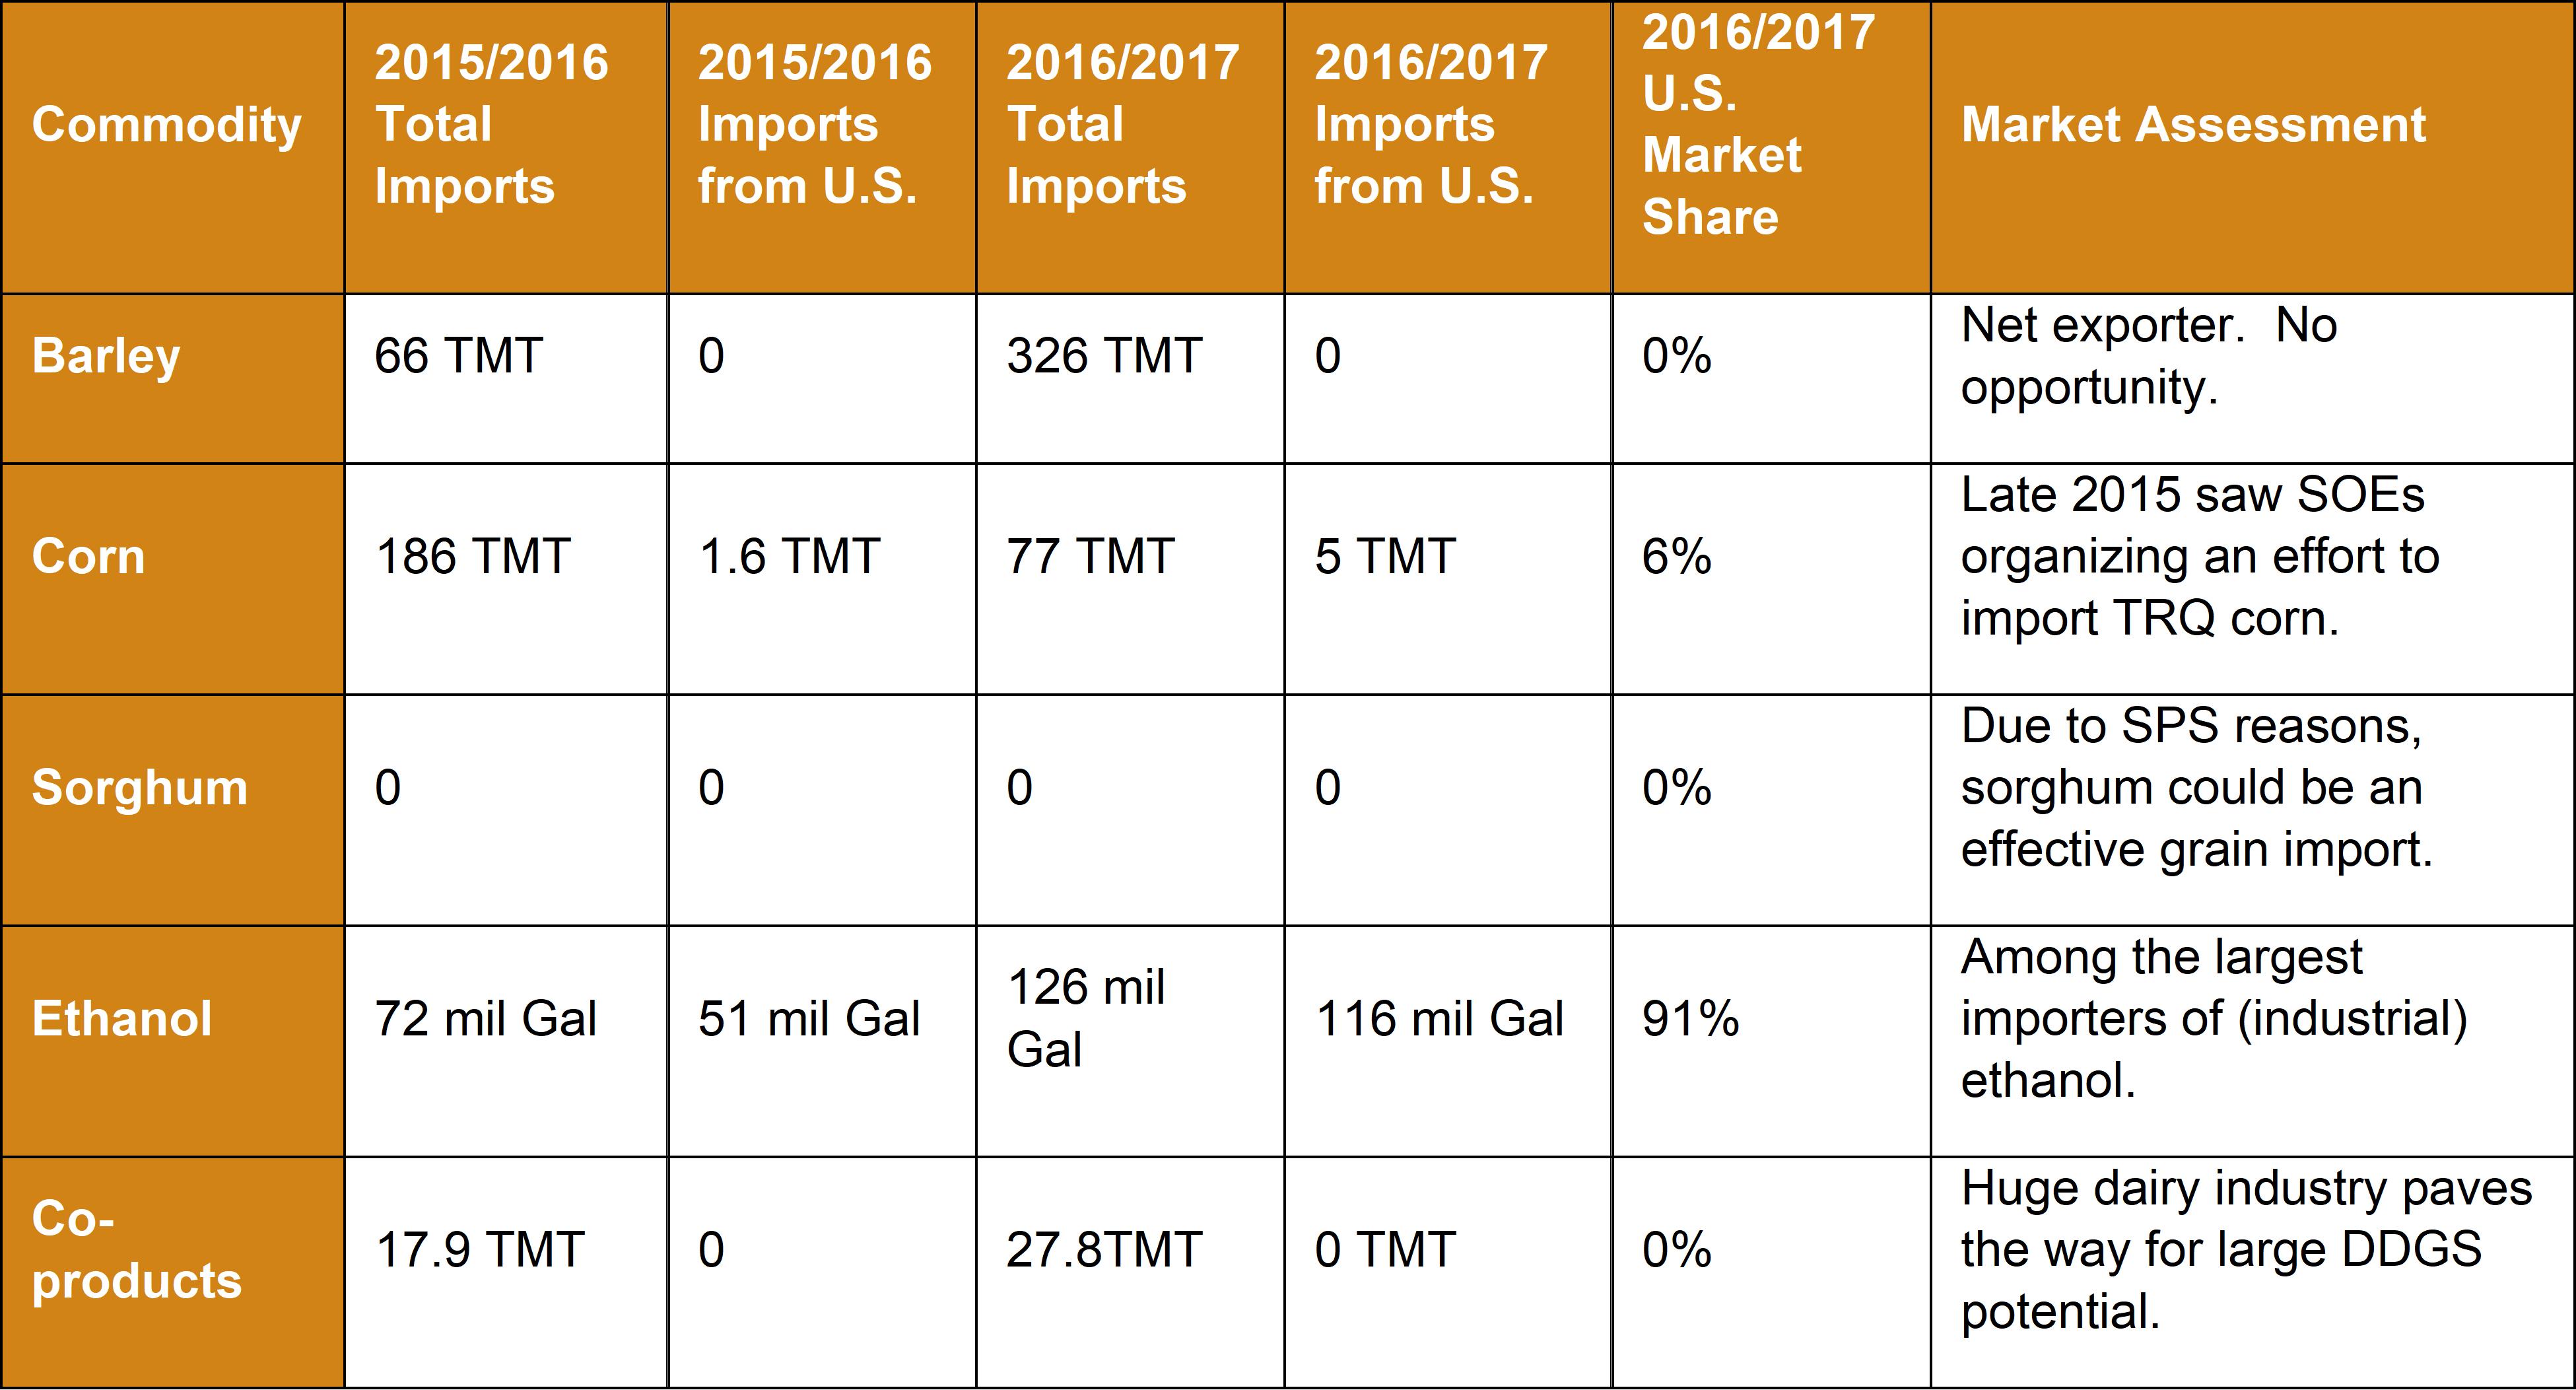 Market Snapshot 2018 - India - Commodity Table